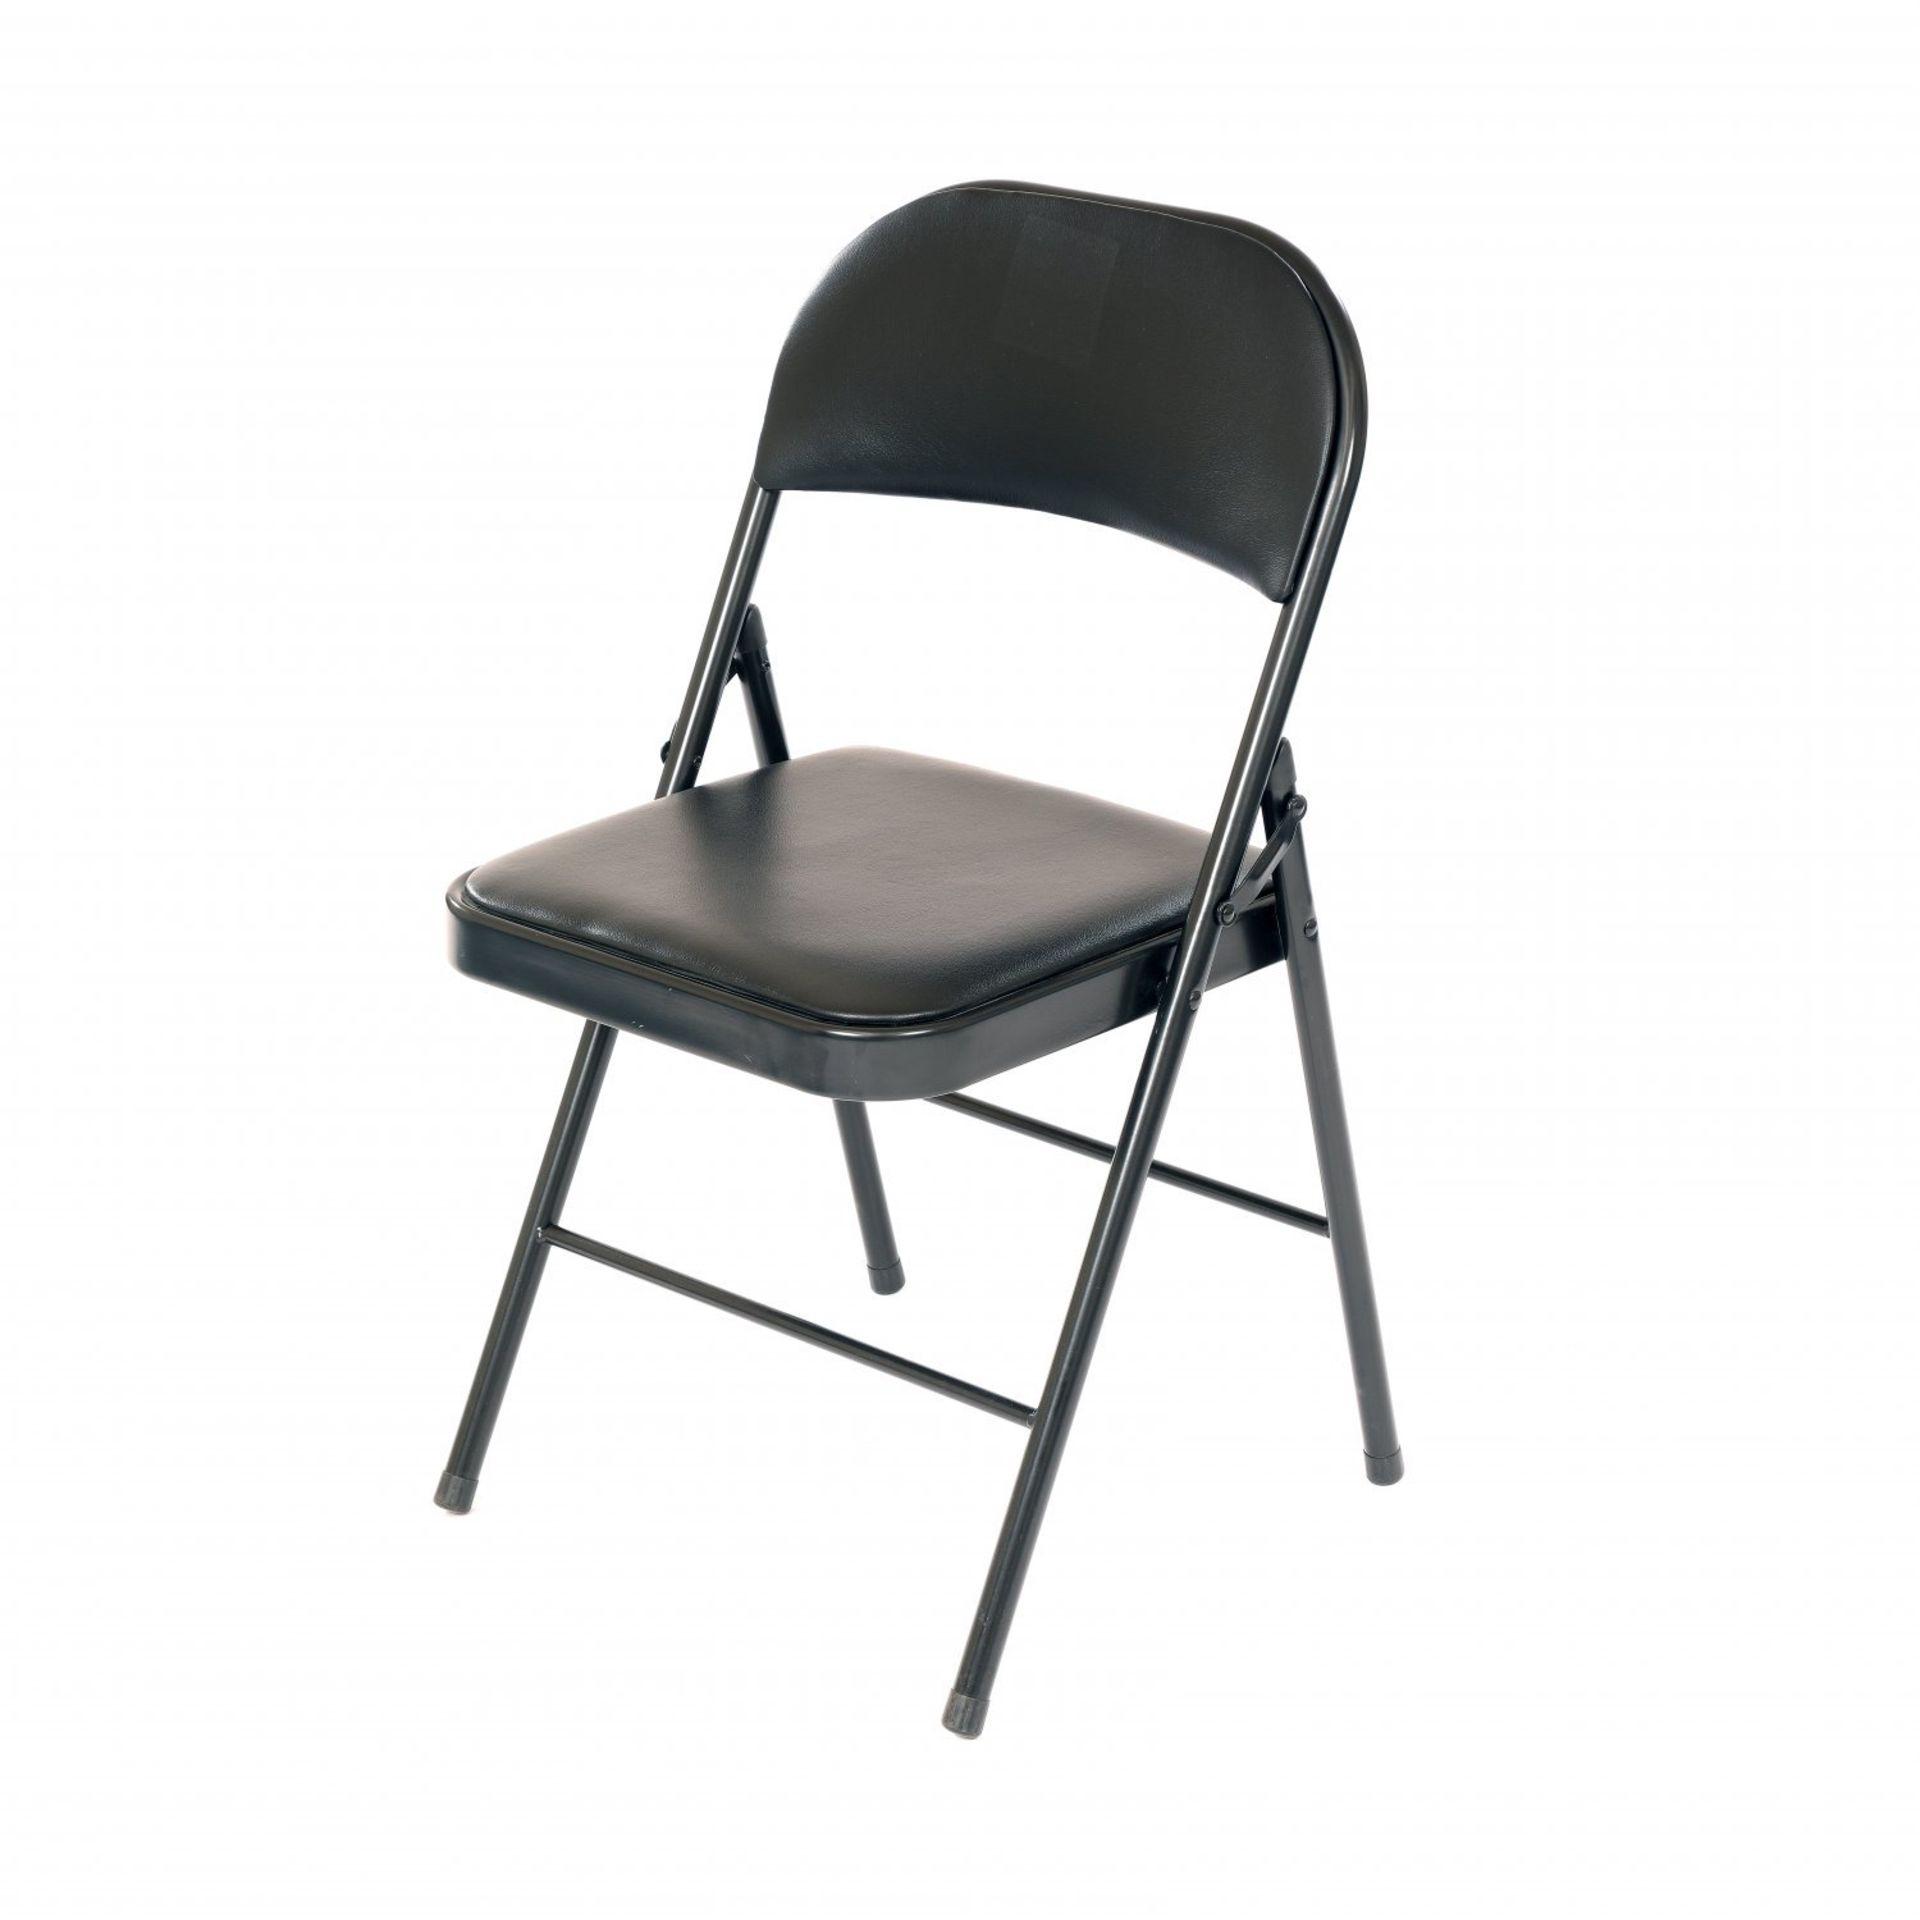 Lot 198 - (SK97) Heavy Duty Padded Folding Metal Desk Office Chair Seat The folding seat is incredib...